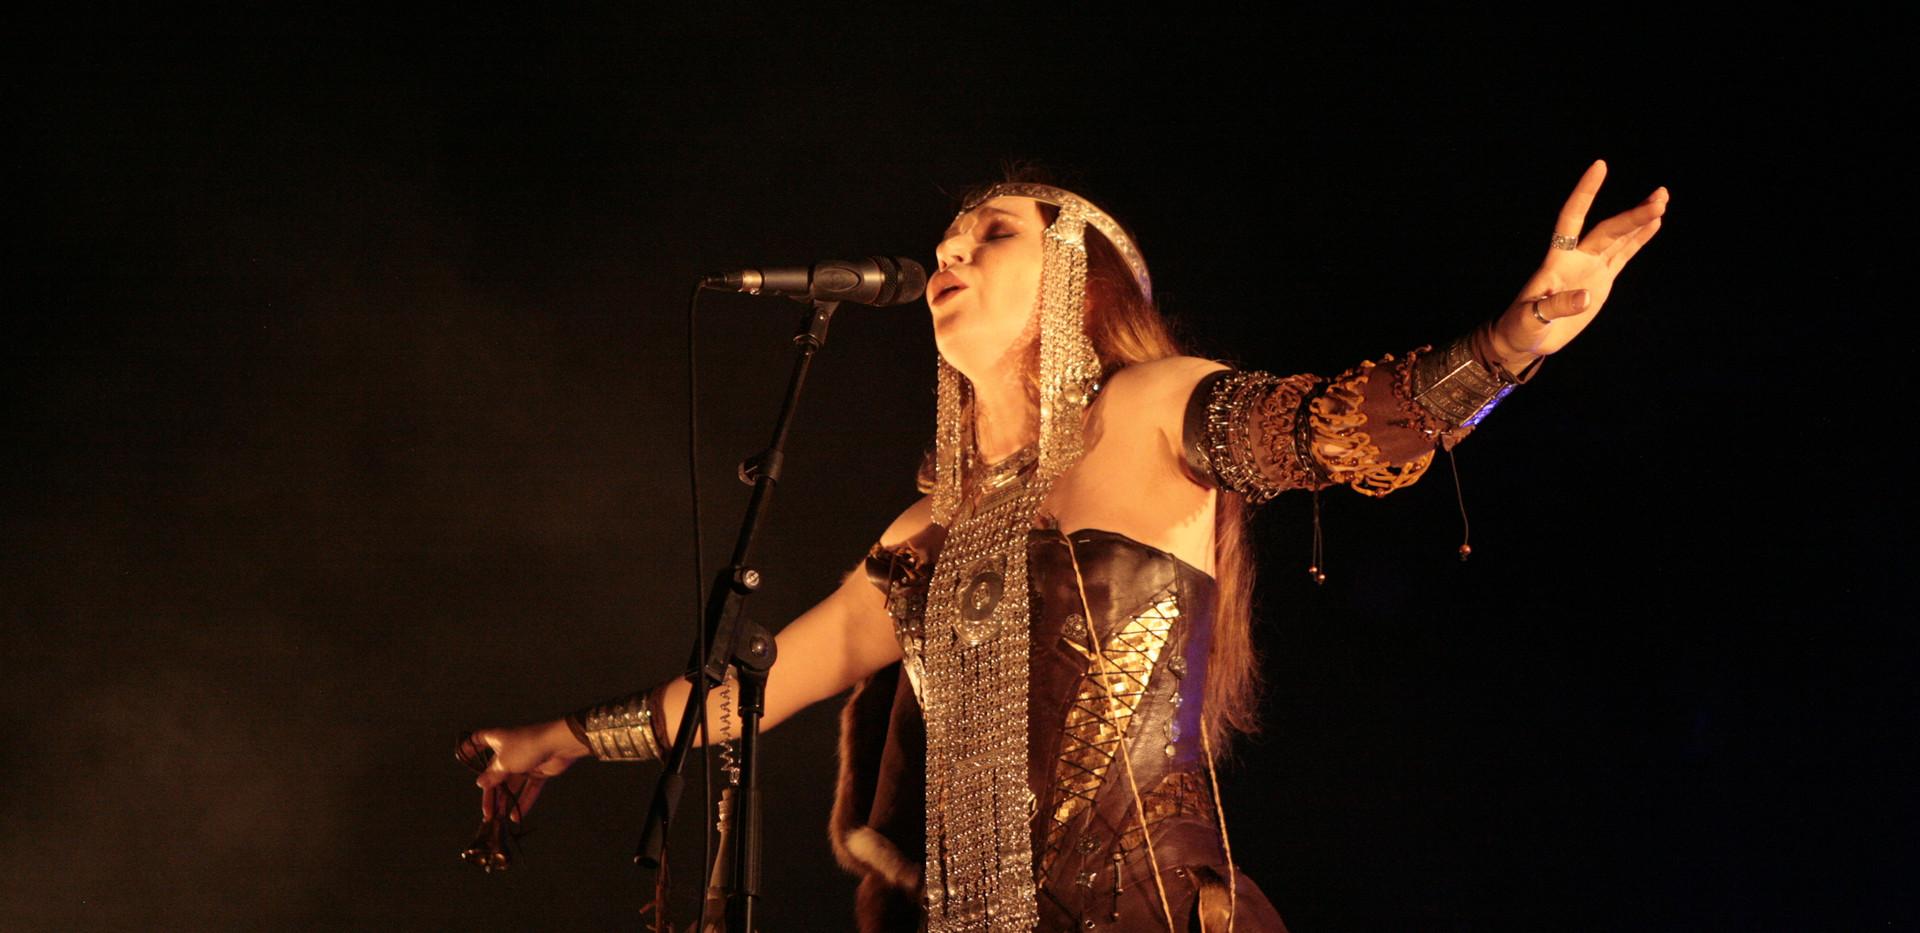 Olena Uutaï